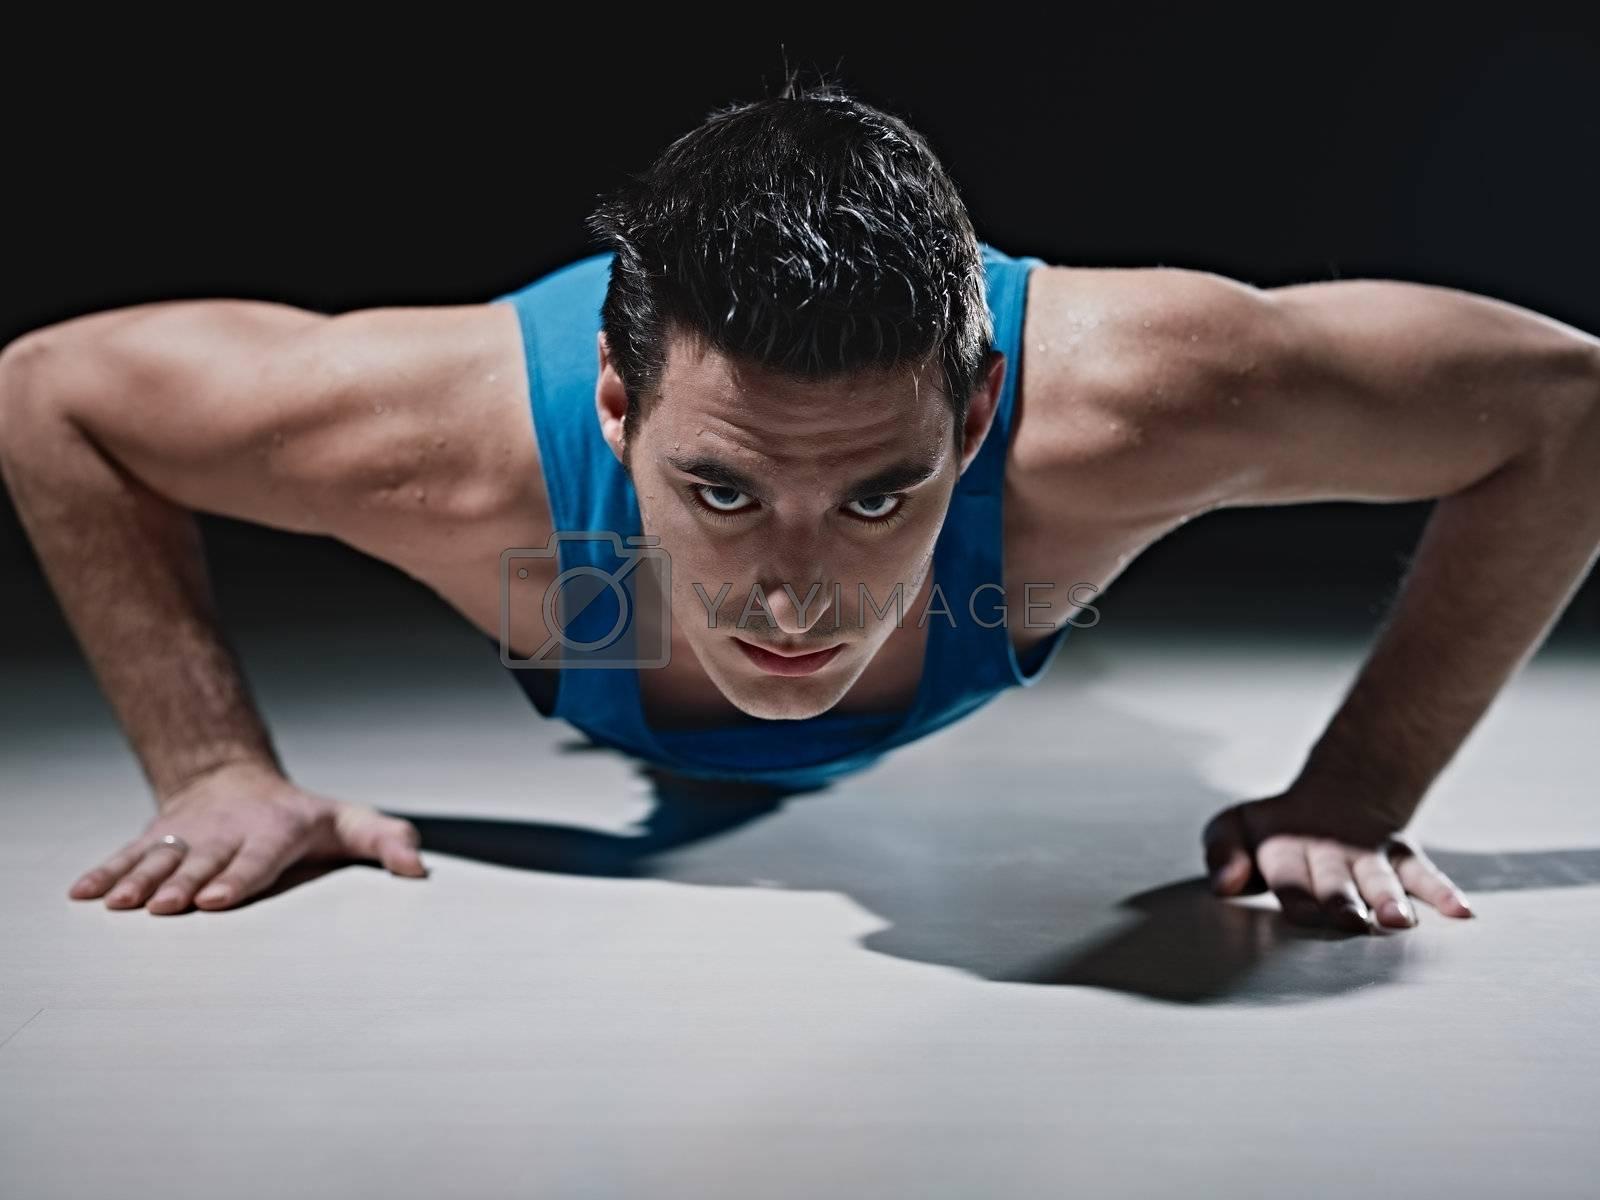 Man doing push-ups on black background by diego_cervo